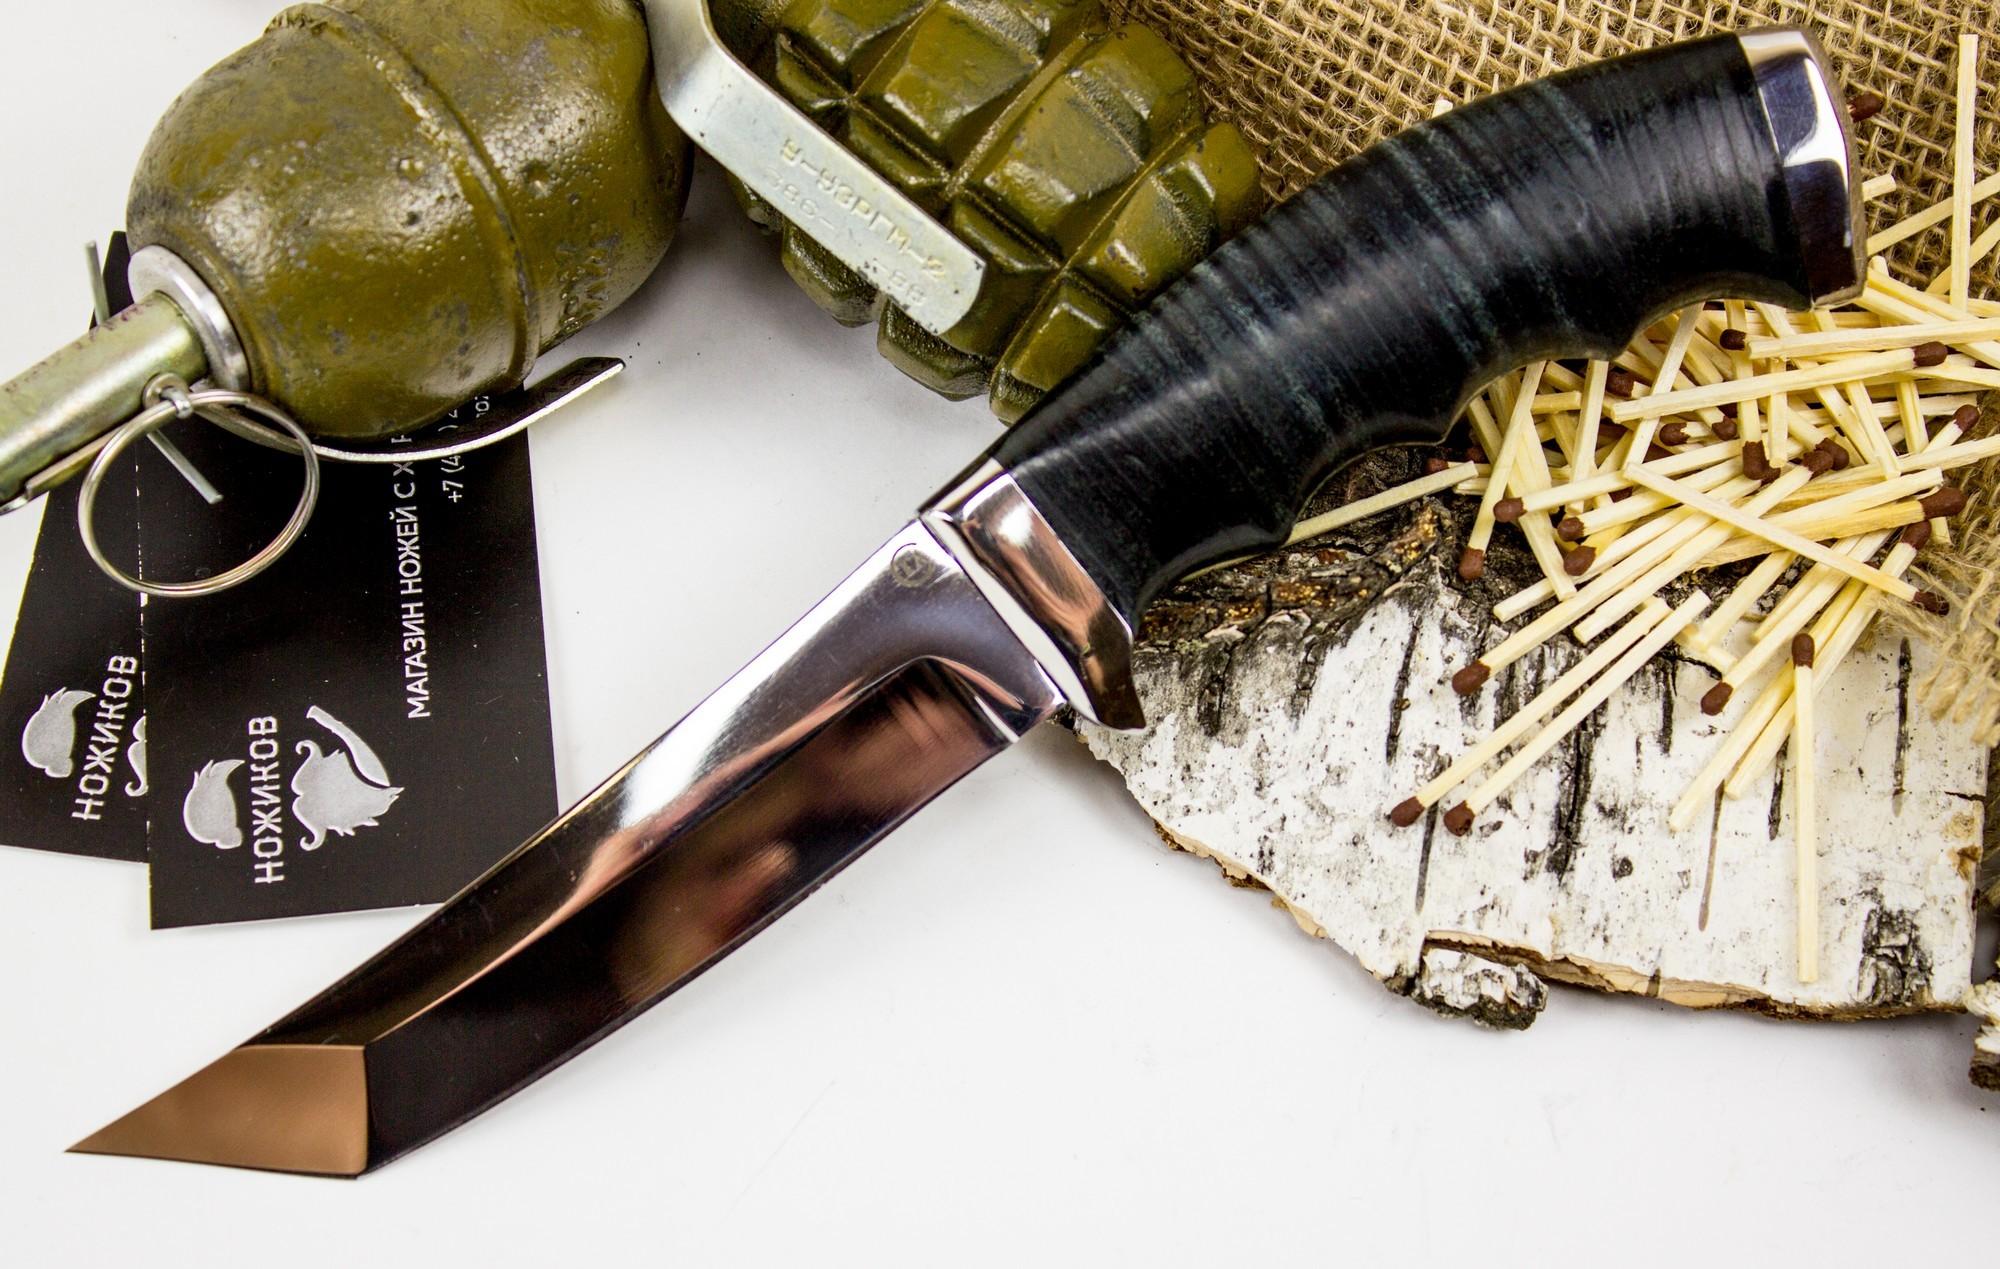 Нож Аркан, сталь 95х18, кожа Титов и Солдатова